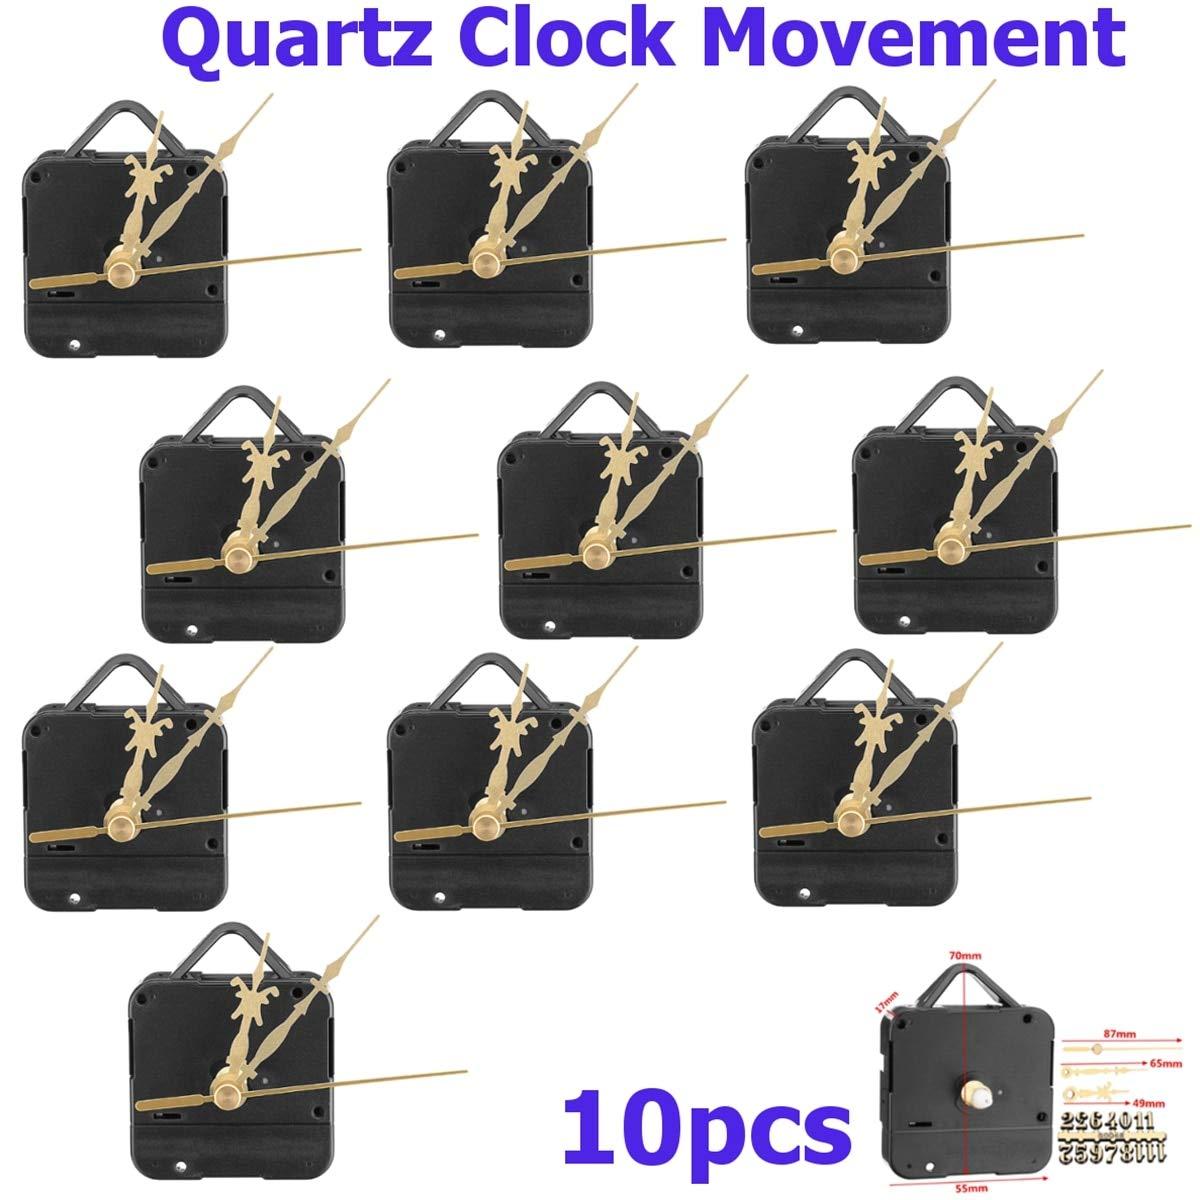 10 pcs Quartz for Tide Clock Movement Gold Quartz Movement Mechanism Silent Clock Motor Kit with Gold Digital Card Hand